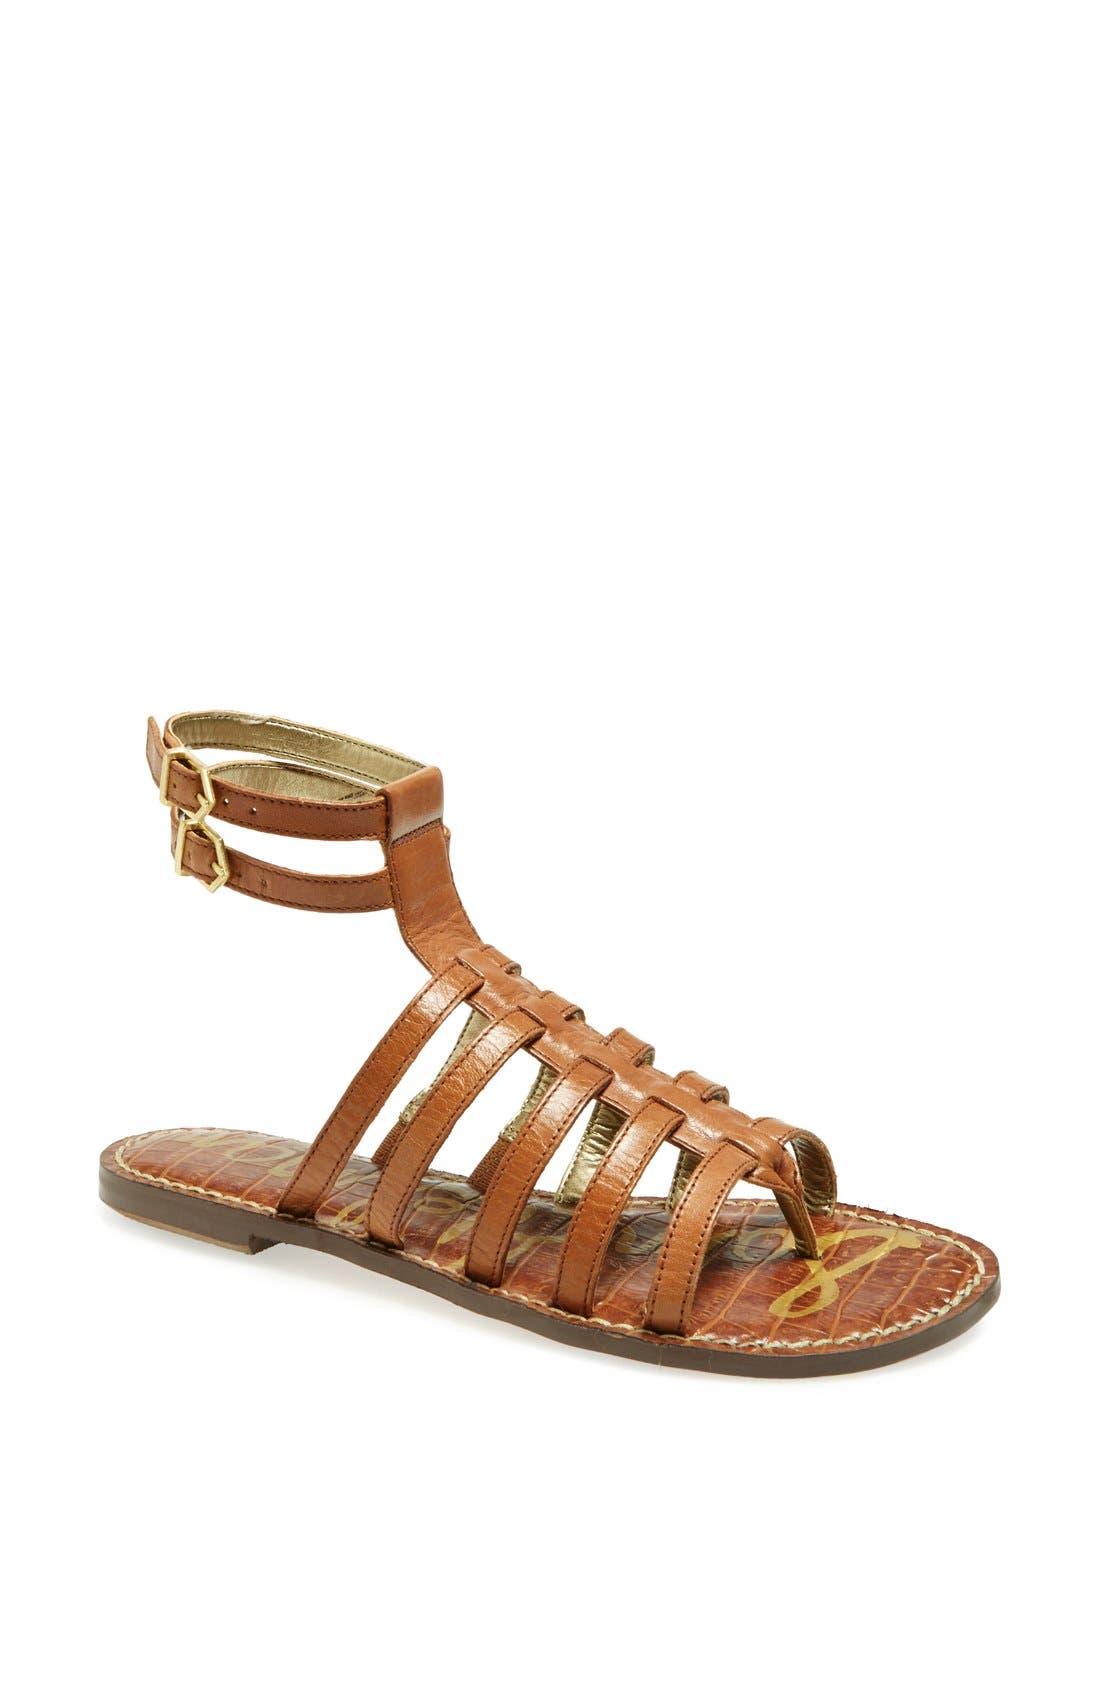 'Gilda' Sandal,                         Main,                         color, Saddle Leather